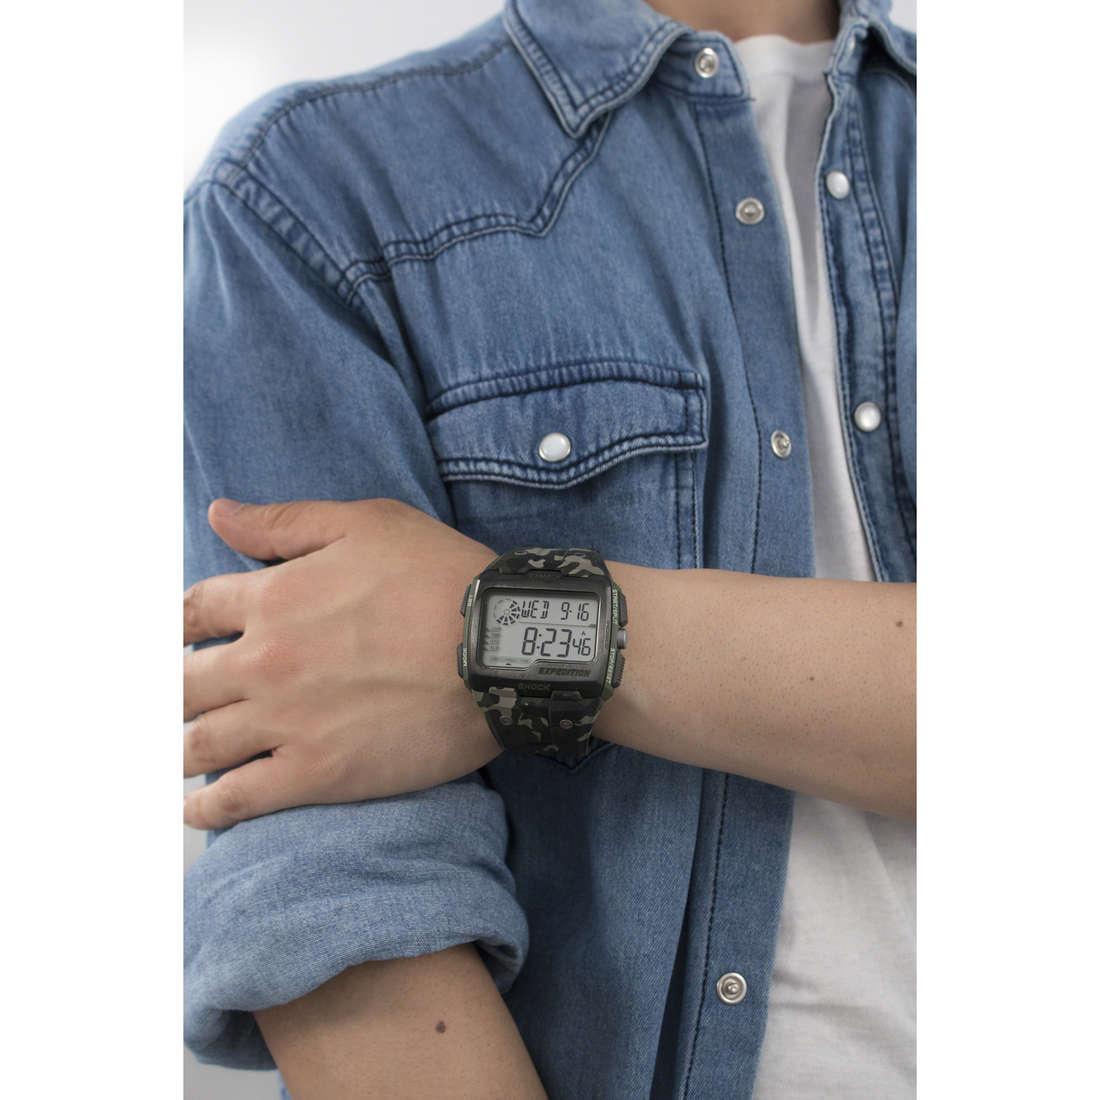 Timex digitali Grid Shock uomo TW4B02900 indosso